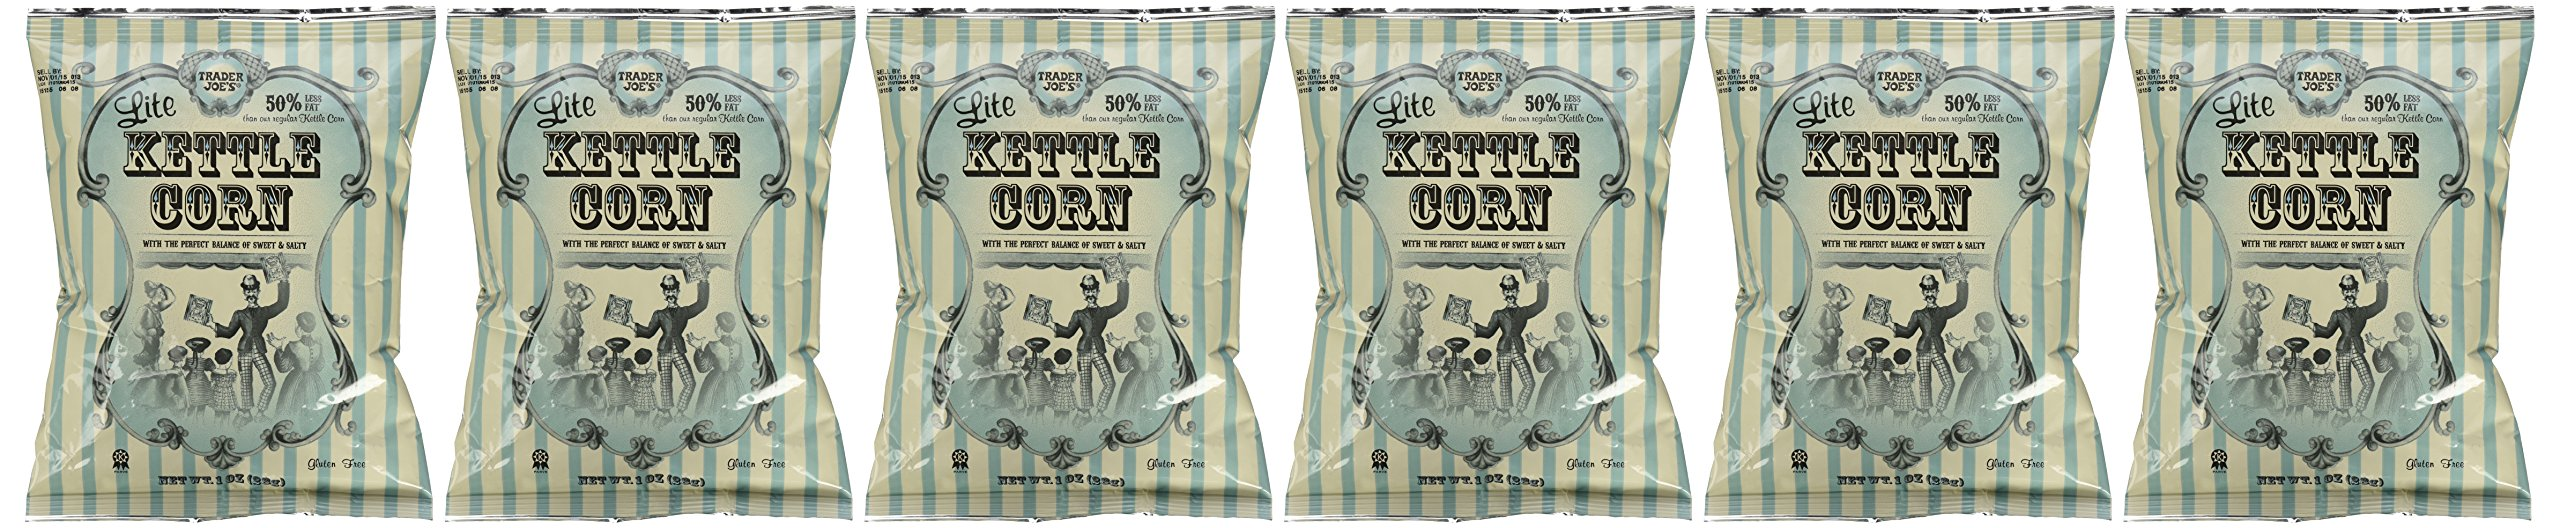 6 Pack of Trader Joe's Lite Kettle Corn